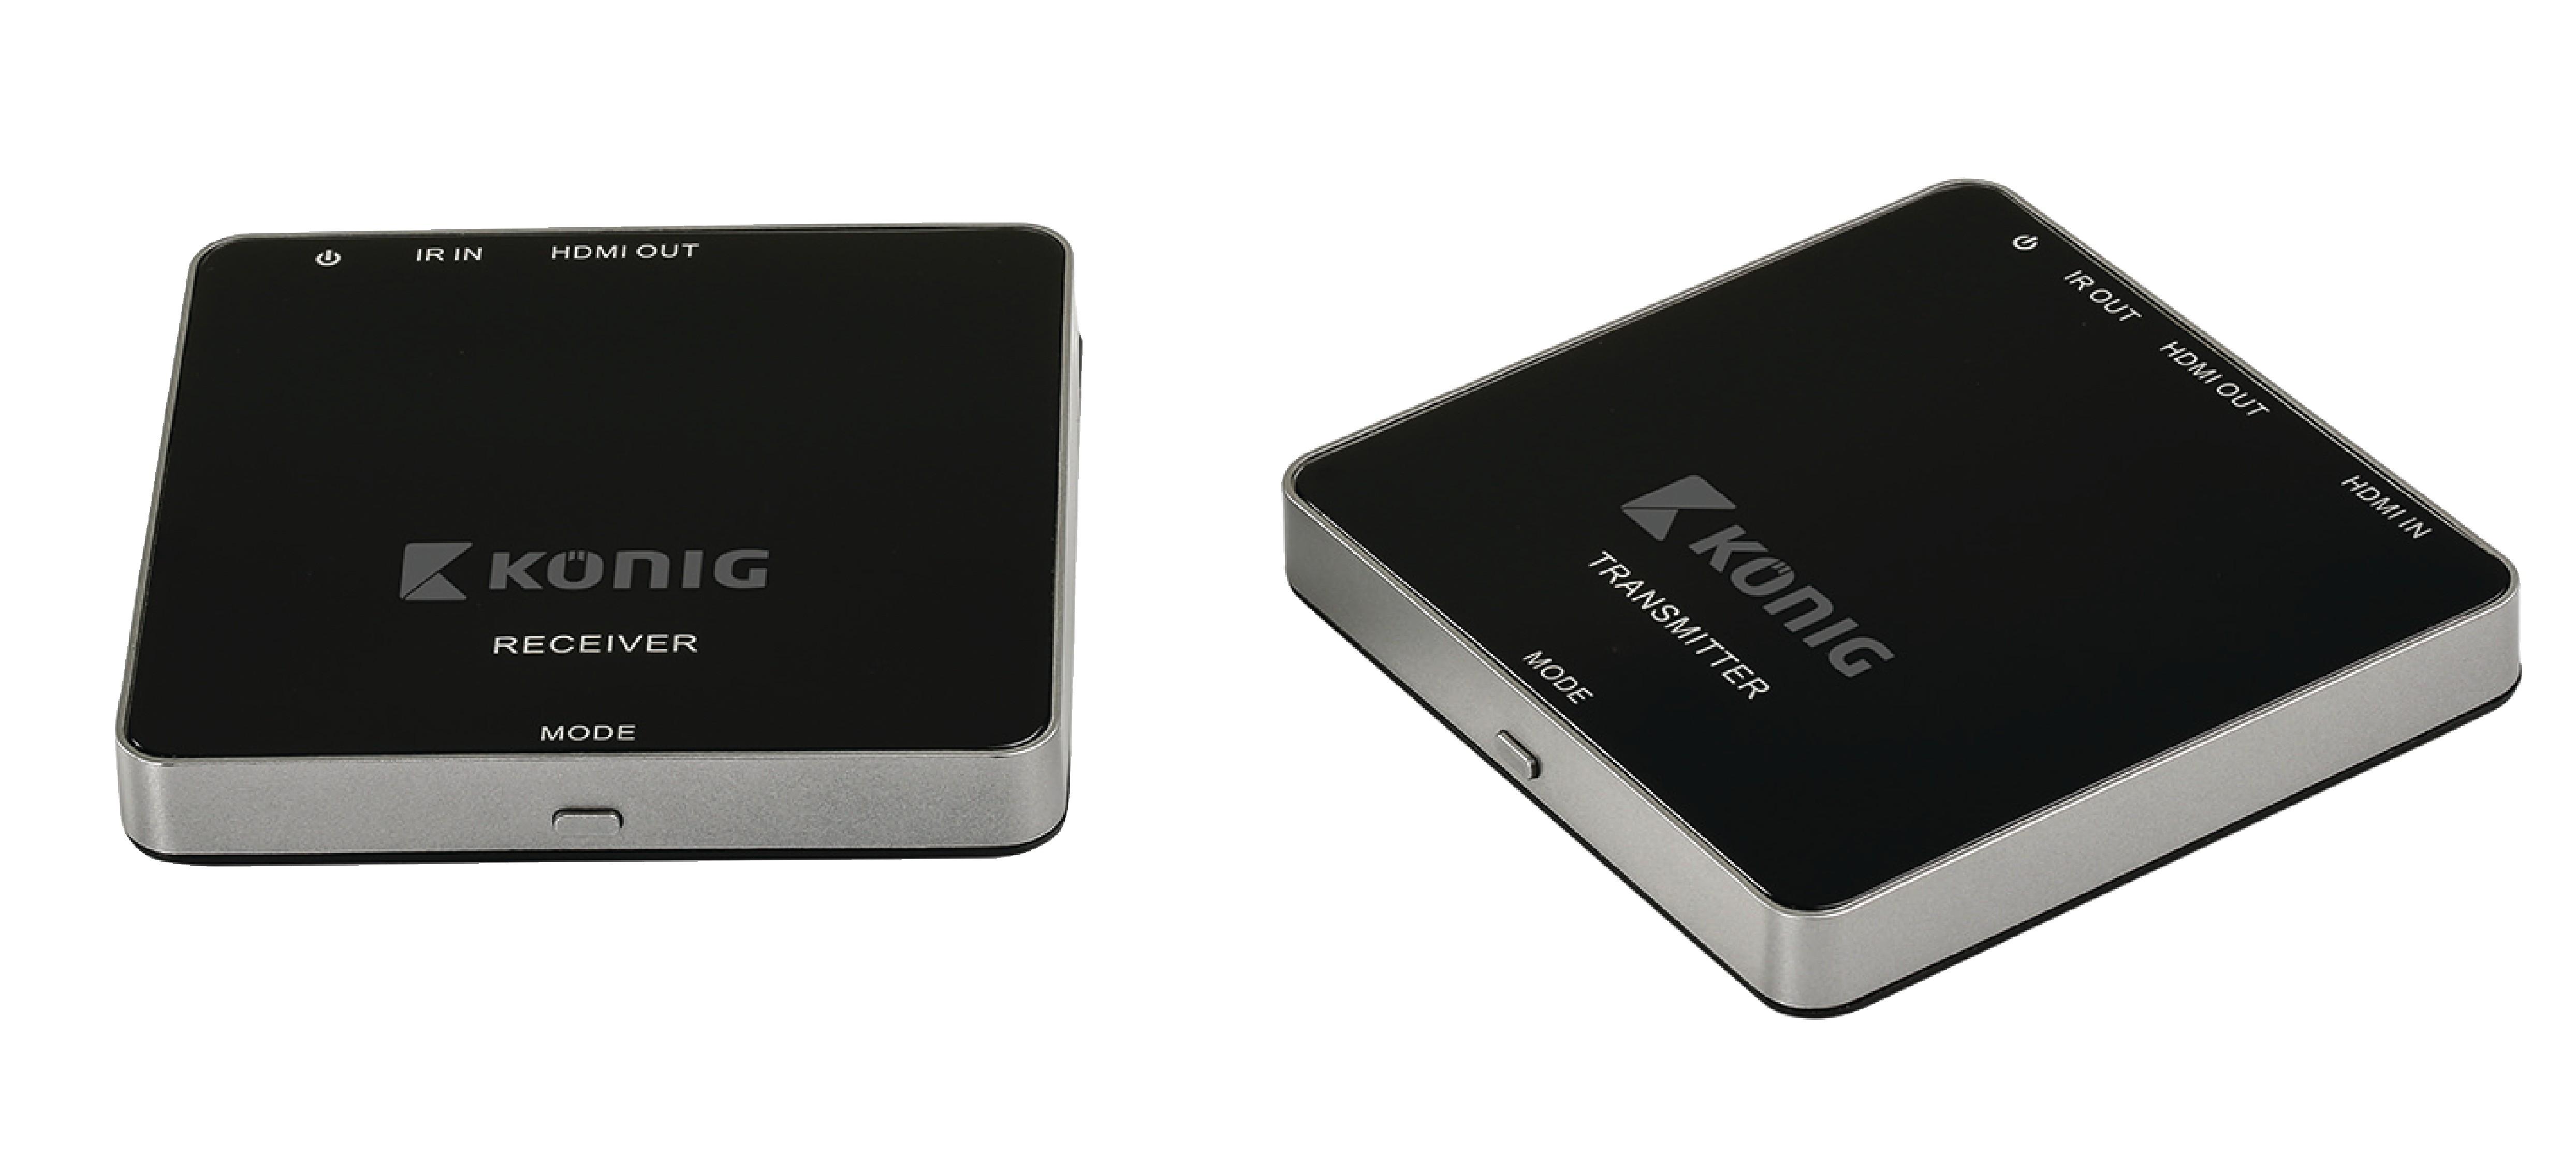 5 GHz bezdrátový transmitter HDMI 1080p do 30 m, König KN-WLHDMI10